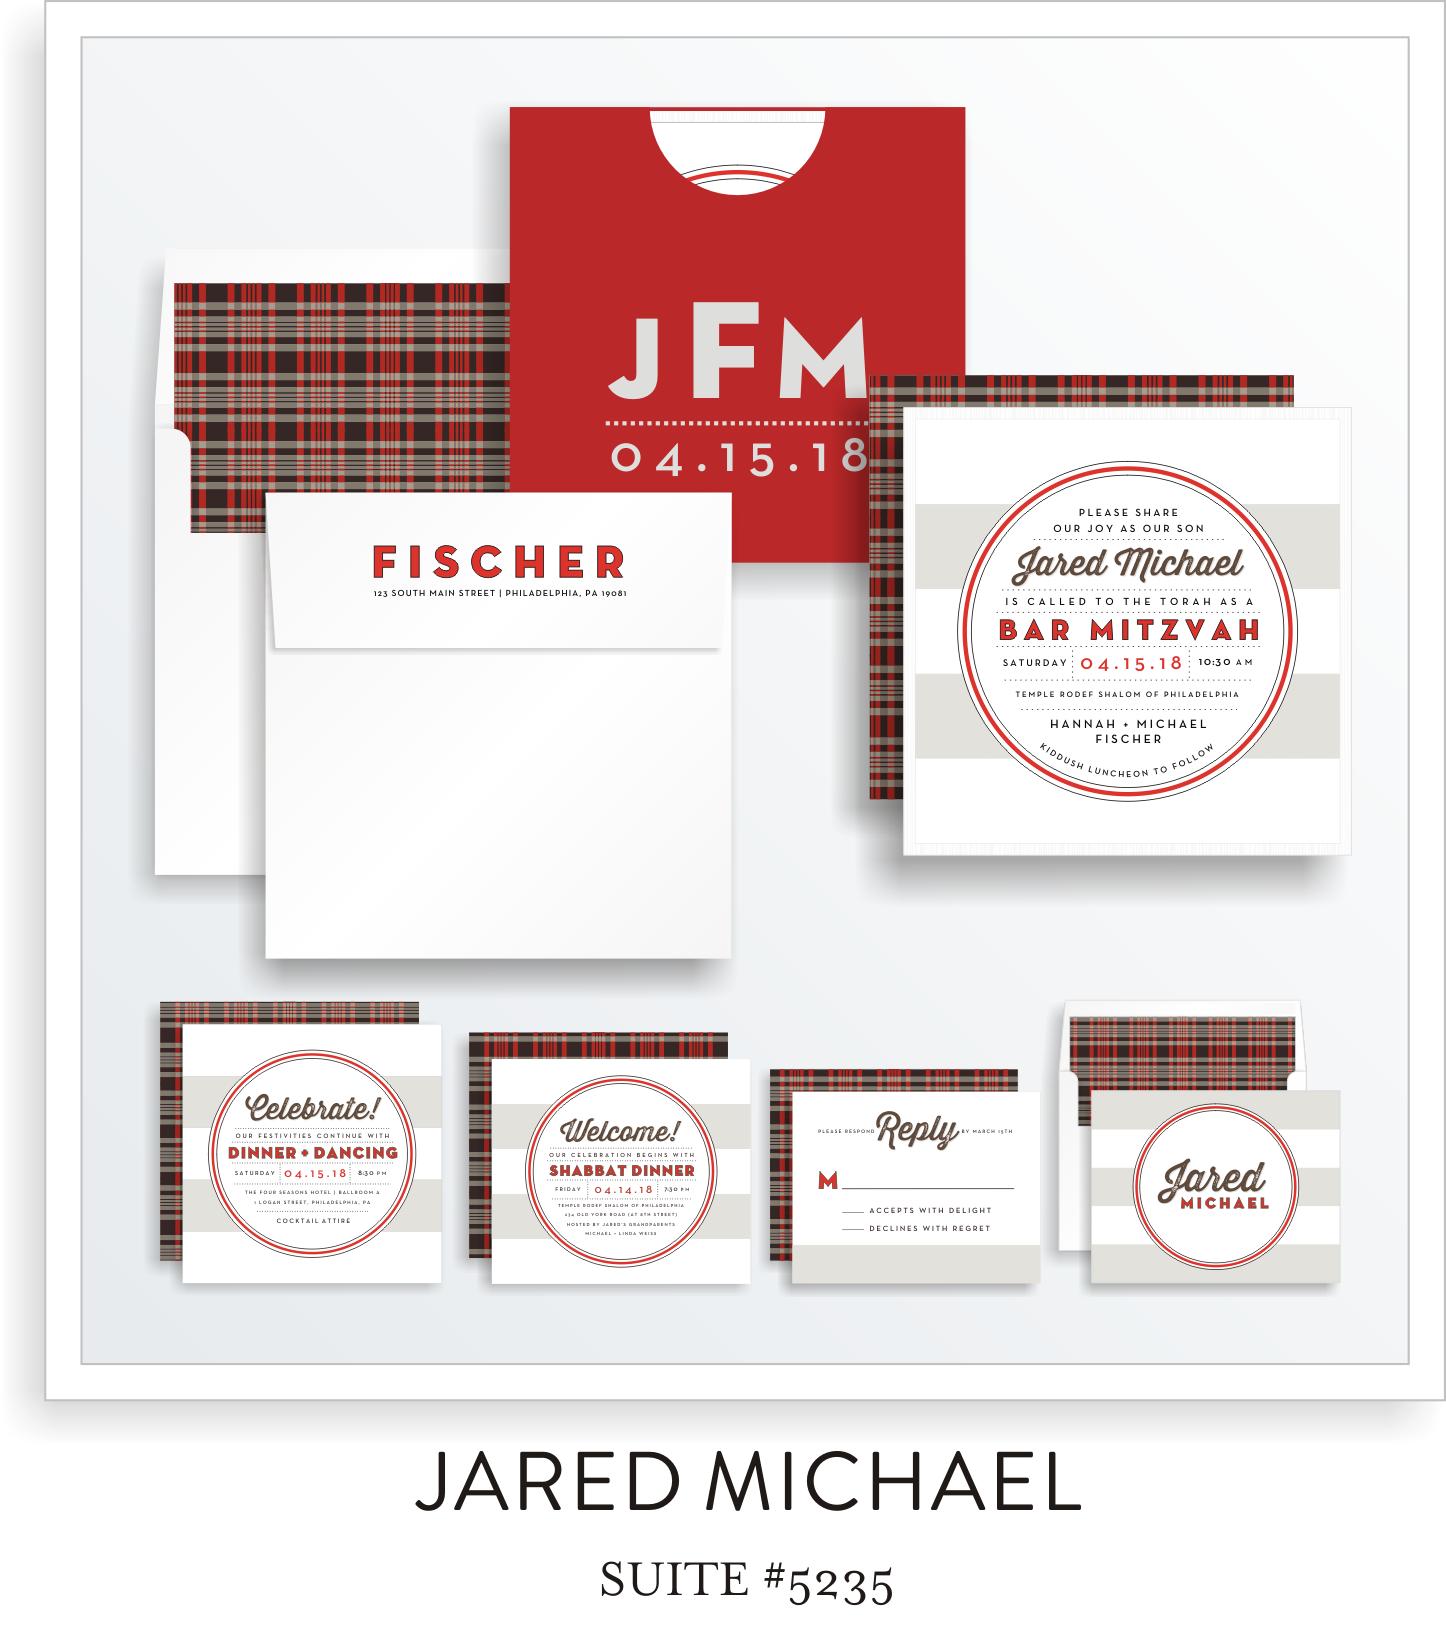 Copy of Copy of Bar Mitzvah Invitation Suite 5235 - Jared Michael